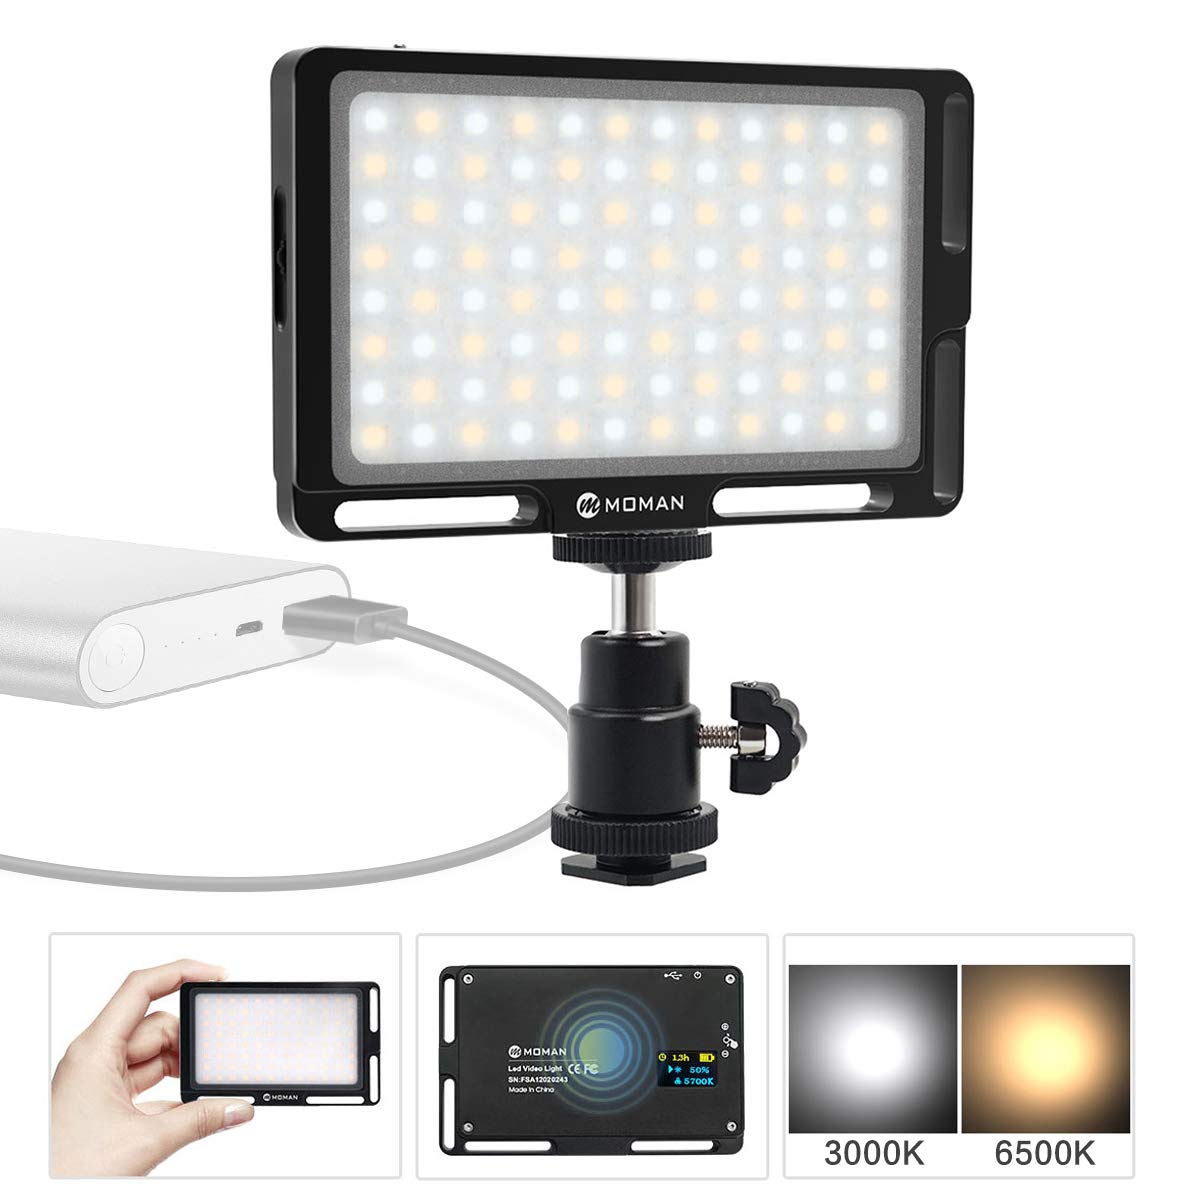 Moman On Camera Video Light for DSLR, 4.5 Inch 96 LED Panel CRI 96 Megnetic Bi-Color 3000K-6500K Brightness Dimmable OLED Display, Aluminum (Black)